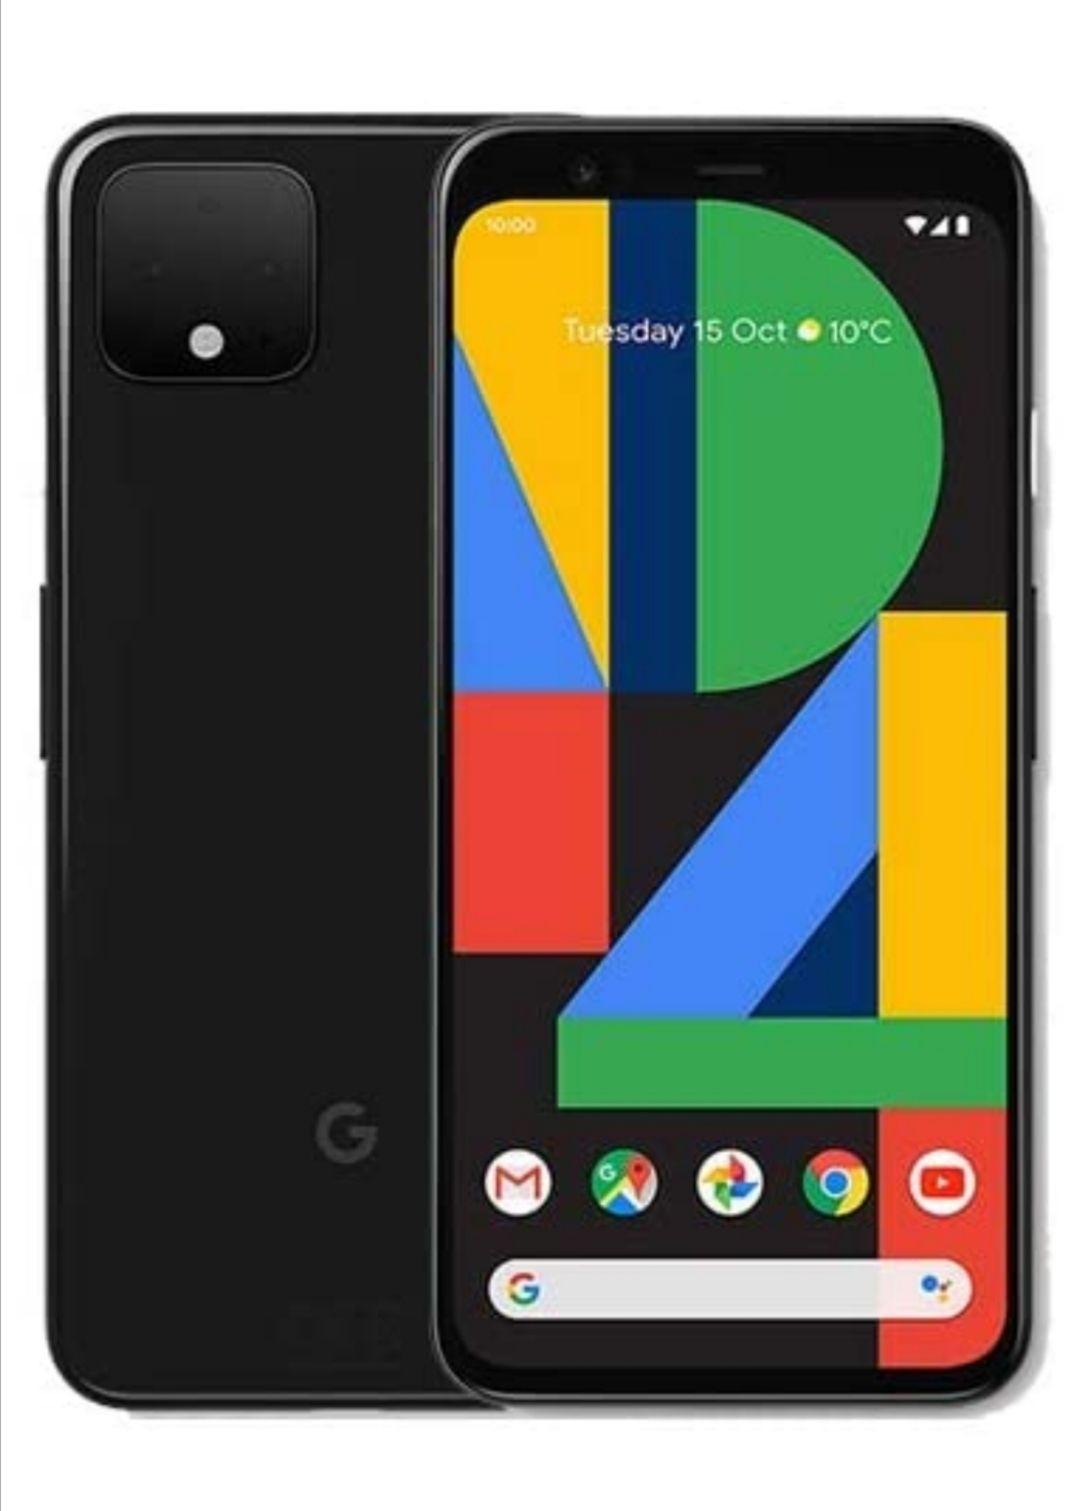 Google Pixel 4 64GB Unlocked Black Smartphone Good Refurbished Condition - £235.99 With Code @ Music Magpie / Ebay